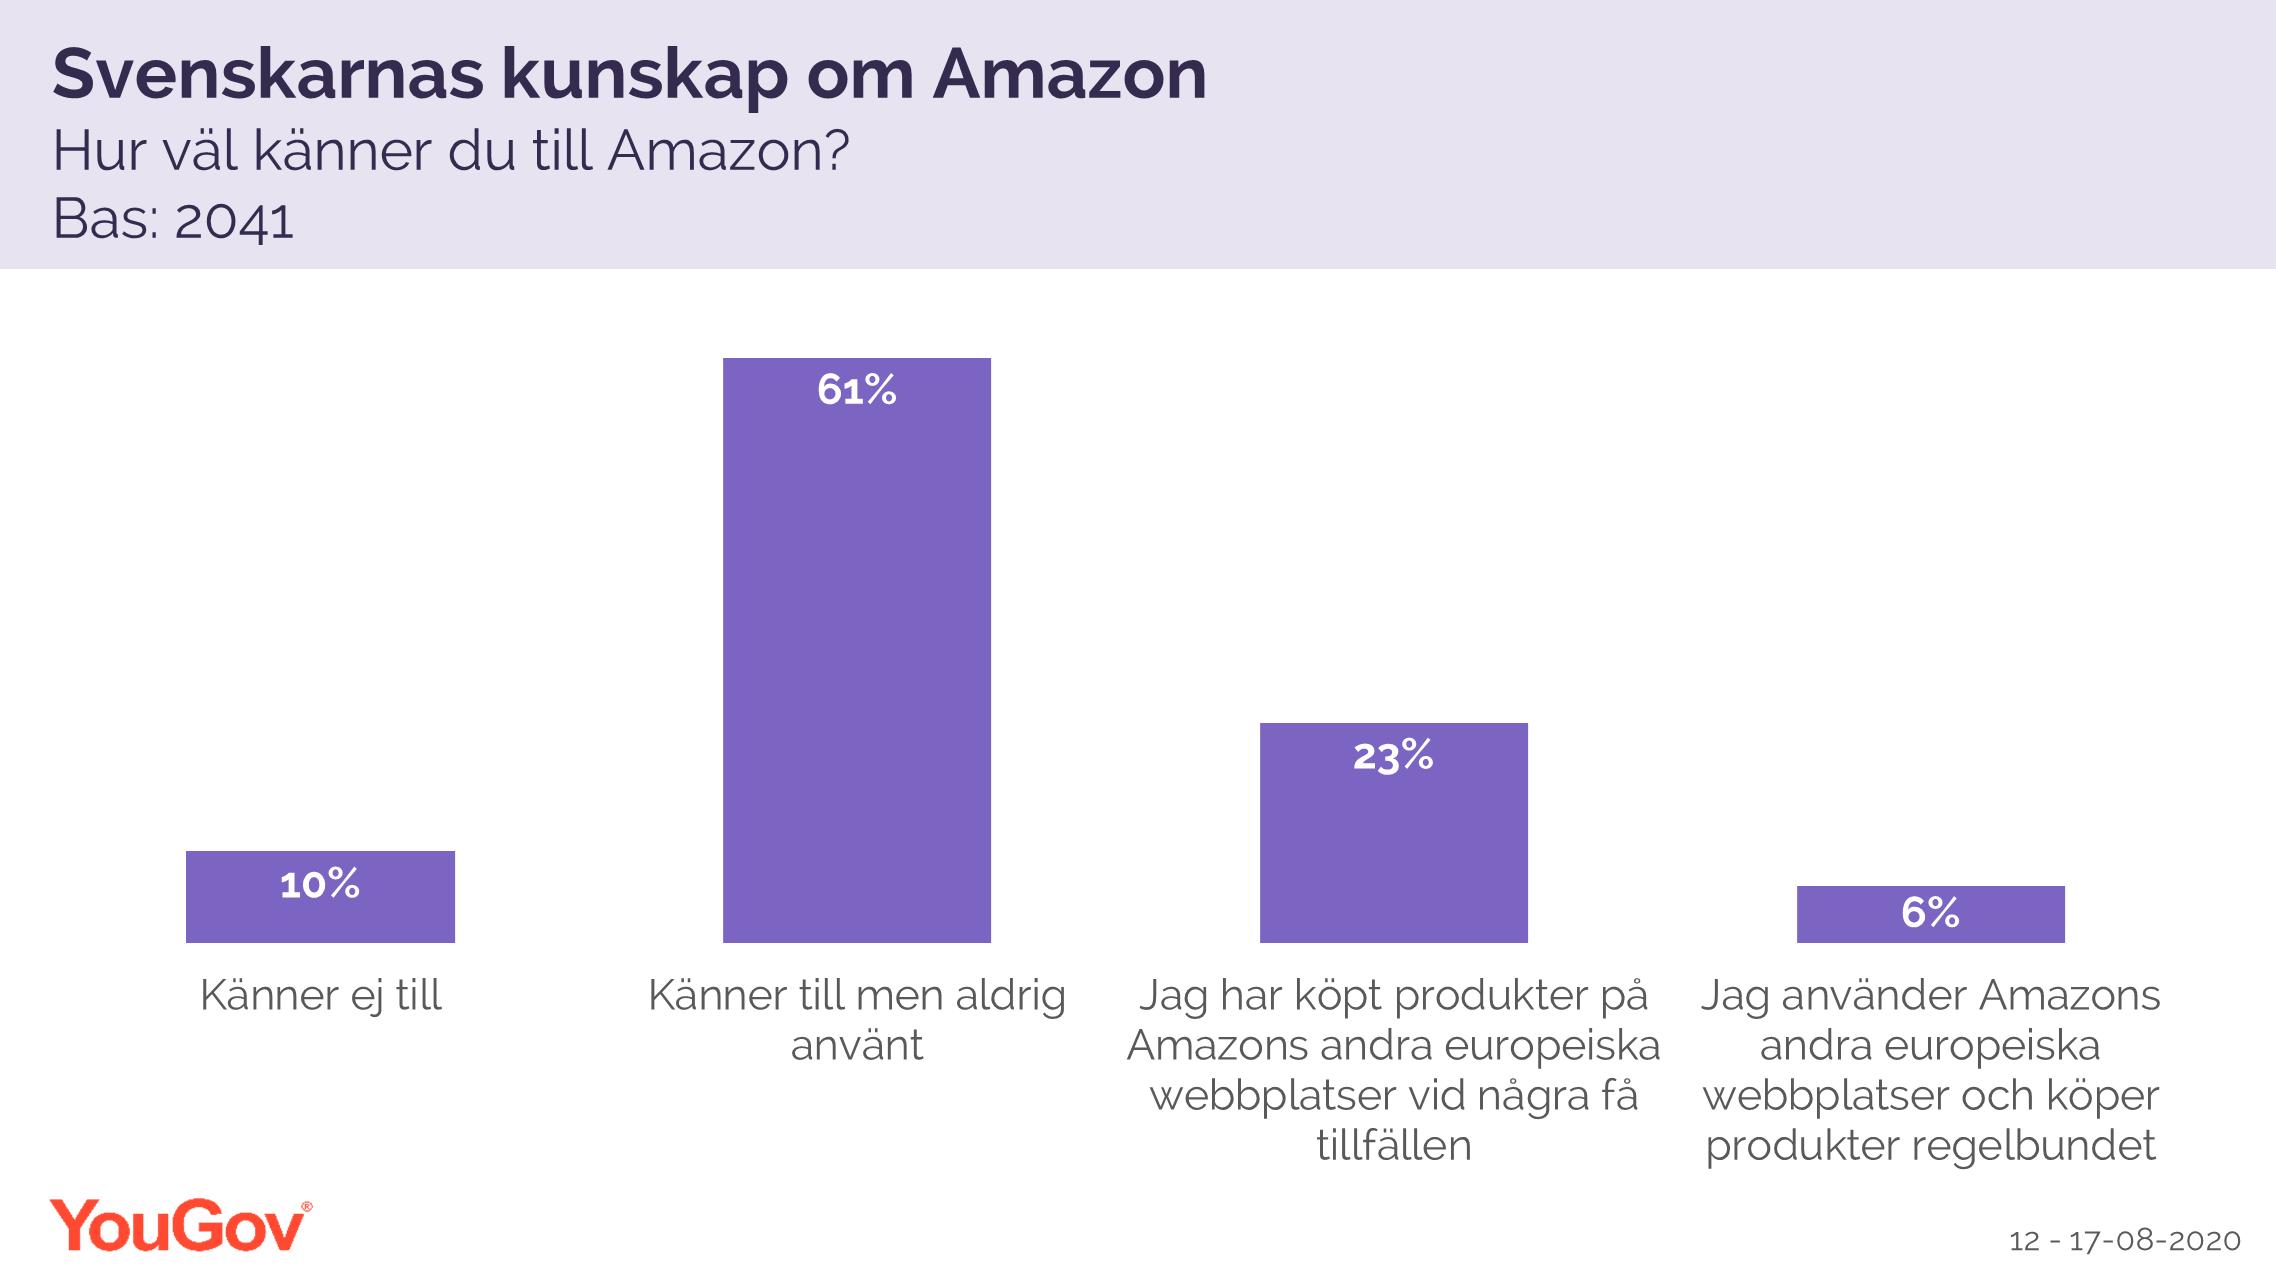 Svenskarnas kunskap om Amazon